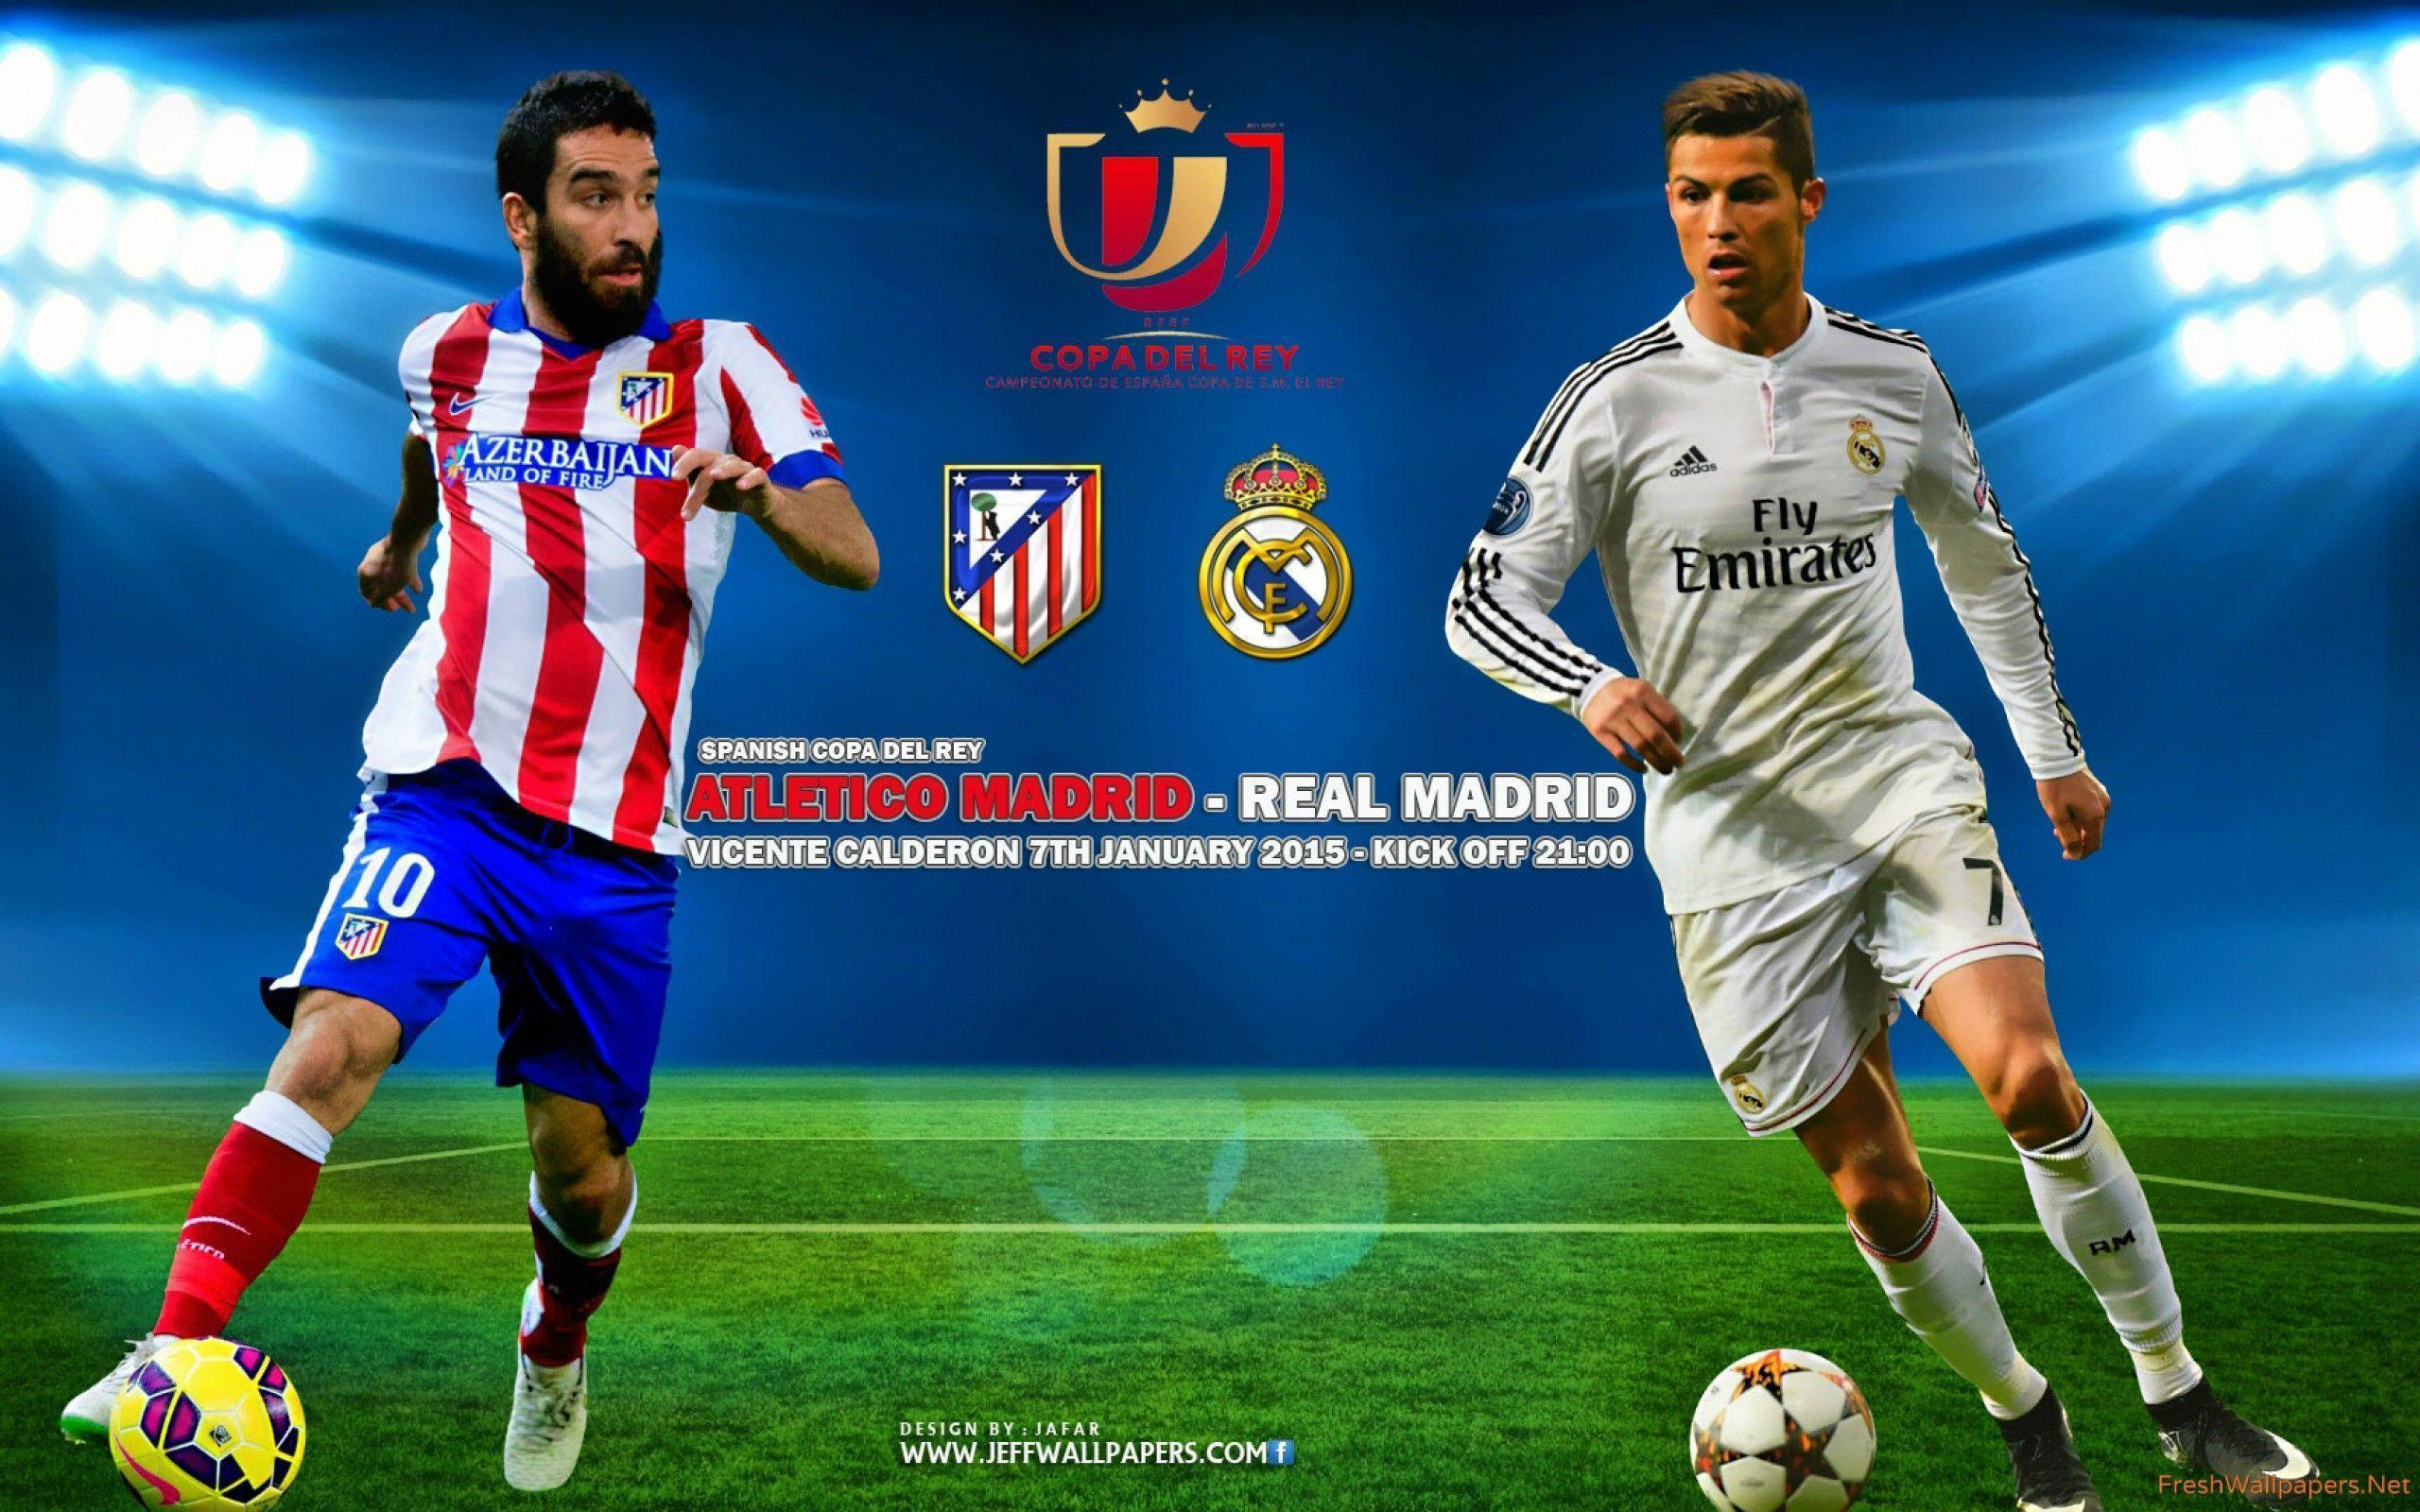 Atlético Madrid Vs Real Madrid: Real Madrid 2015 Wallpapers 3D